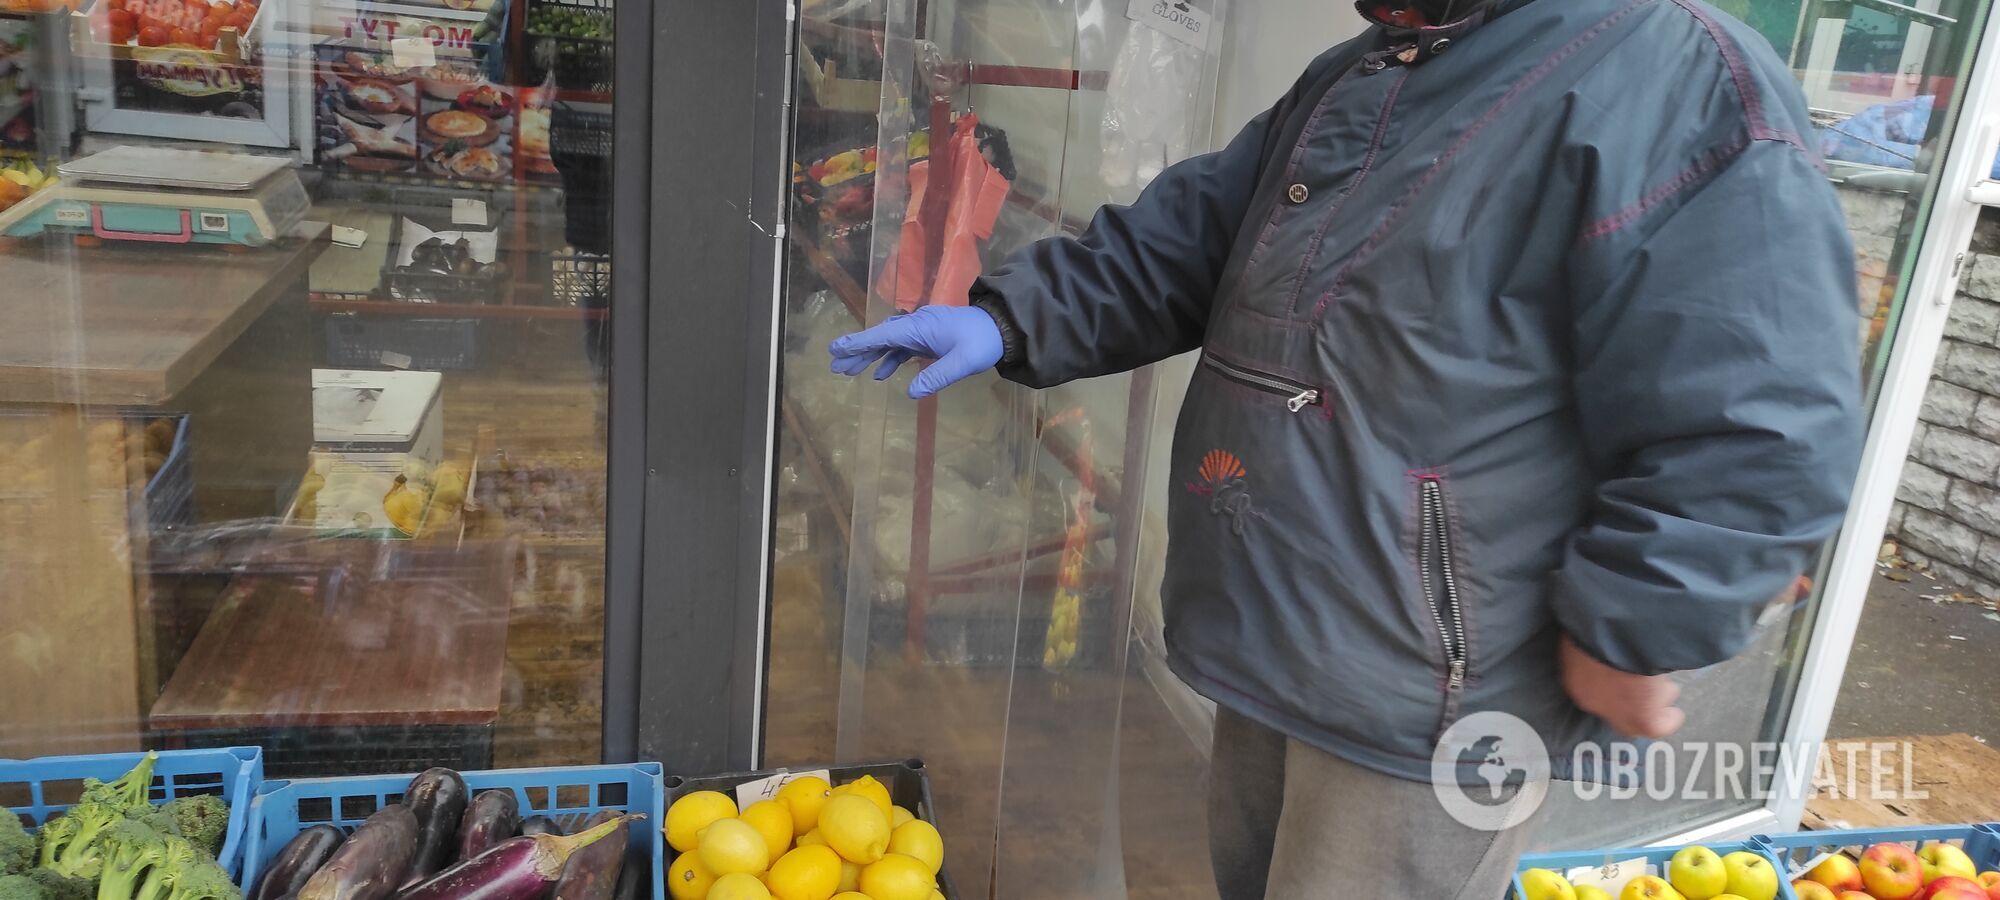 Некоторые продавцы носят одну перчатку.